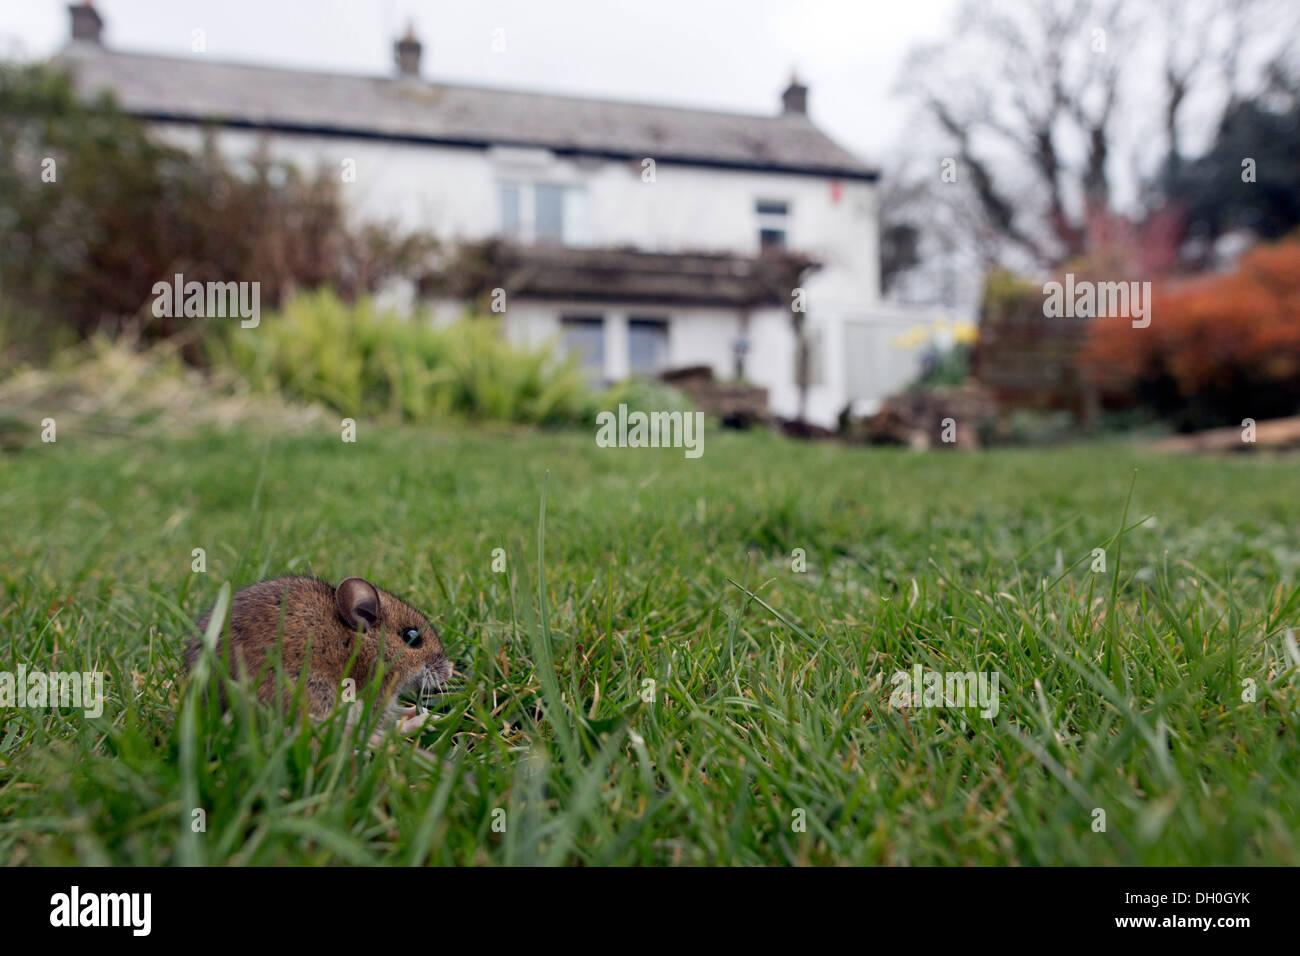 Wood Mouse; Apodemus sylvaticus; in Garden; UK Stock Photo